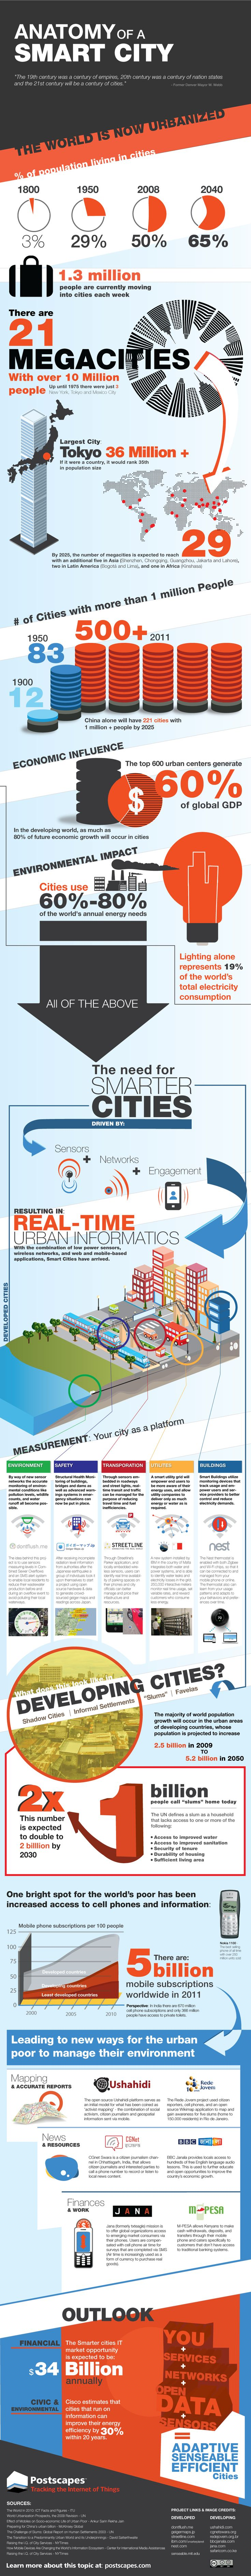 Anatomy of a Smart City